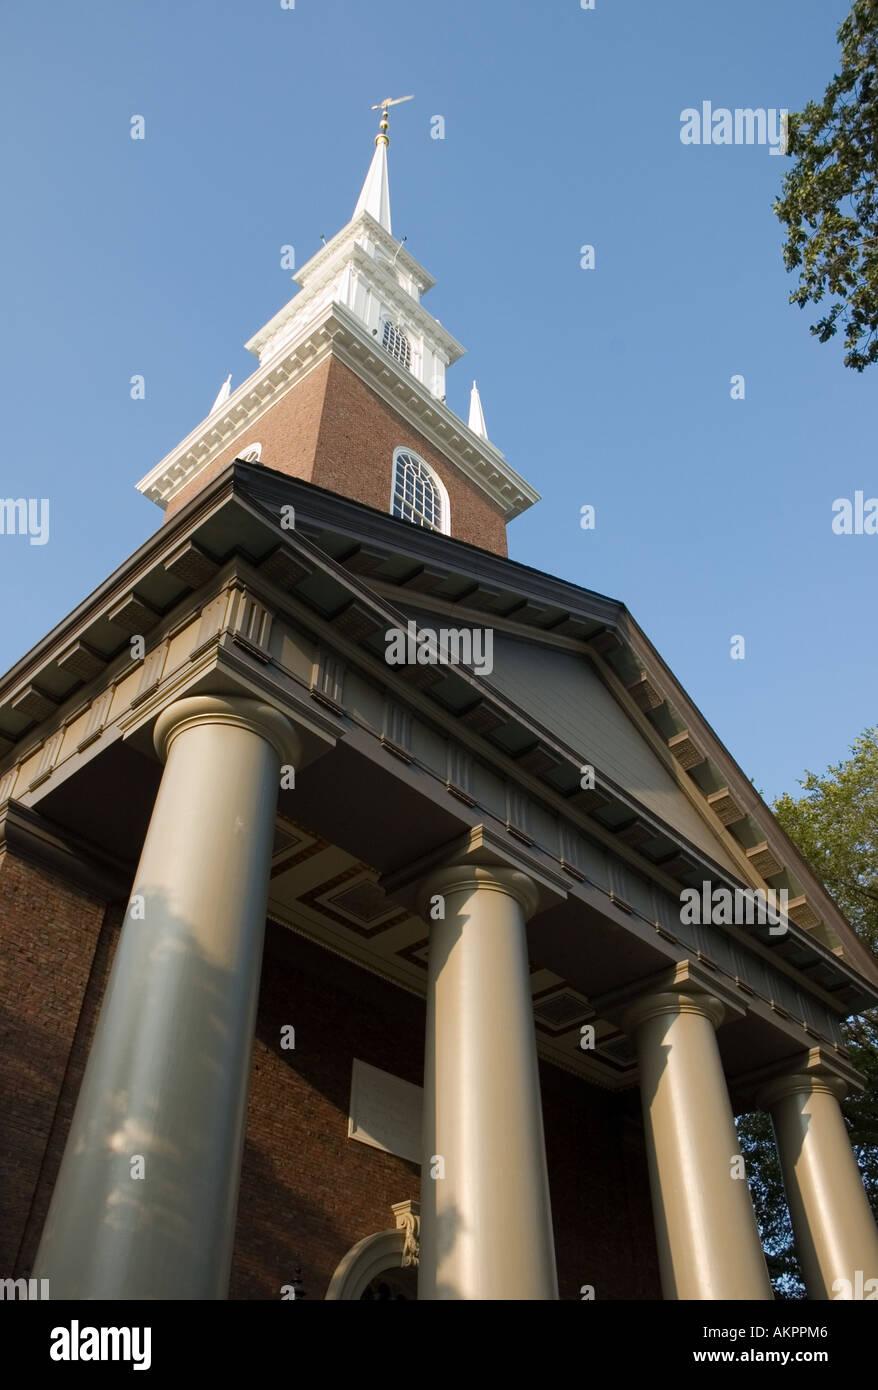 Memorial Church at Harvard University in Cambridge Massachusetts - Stock Image